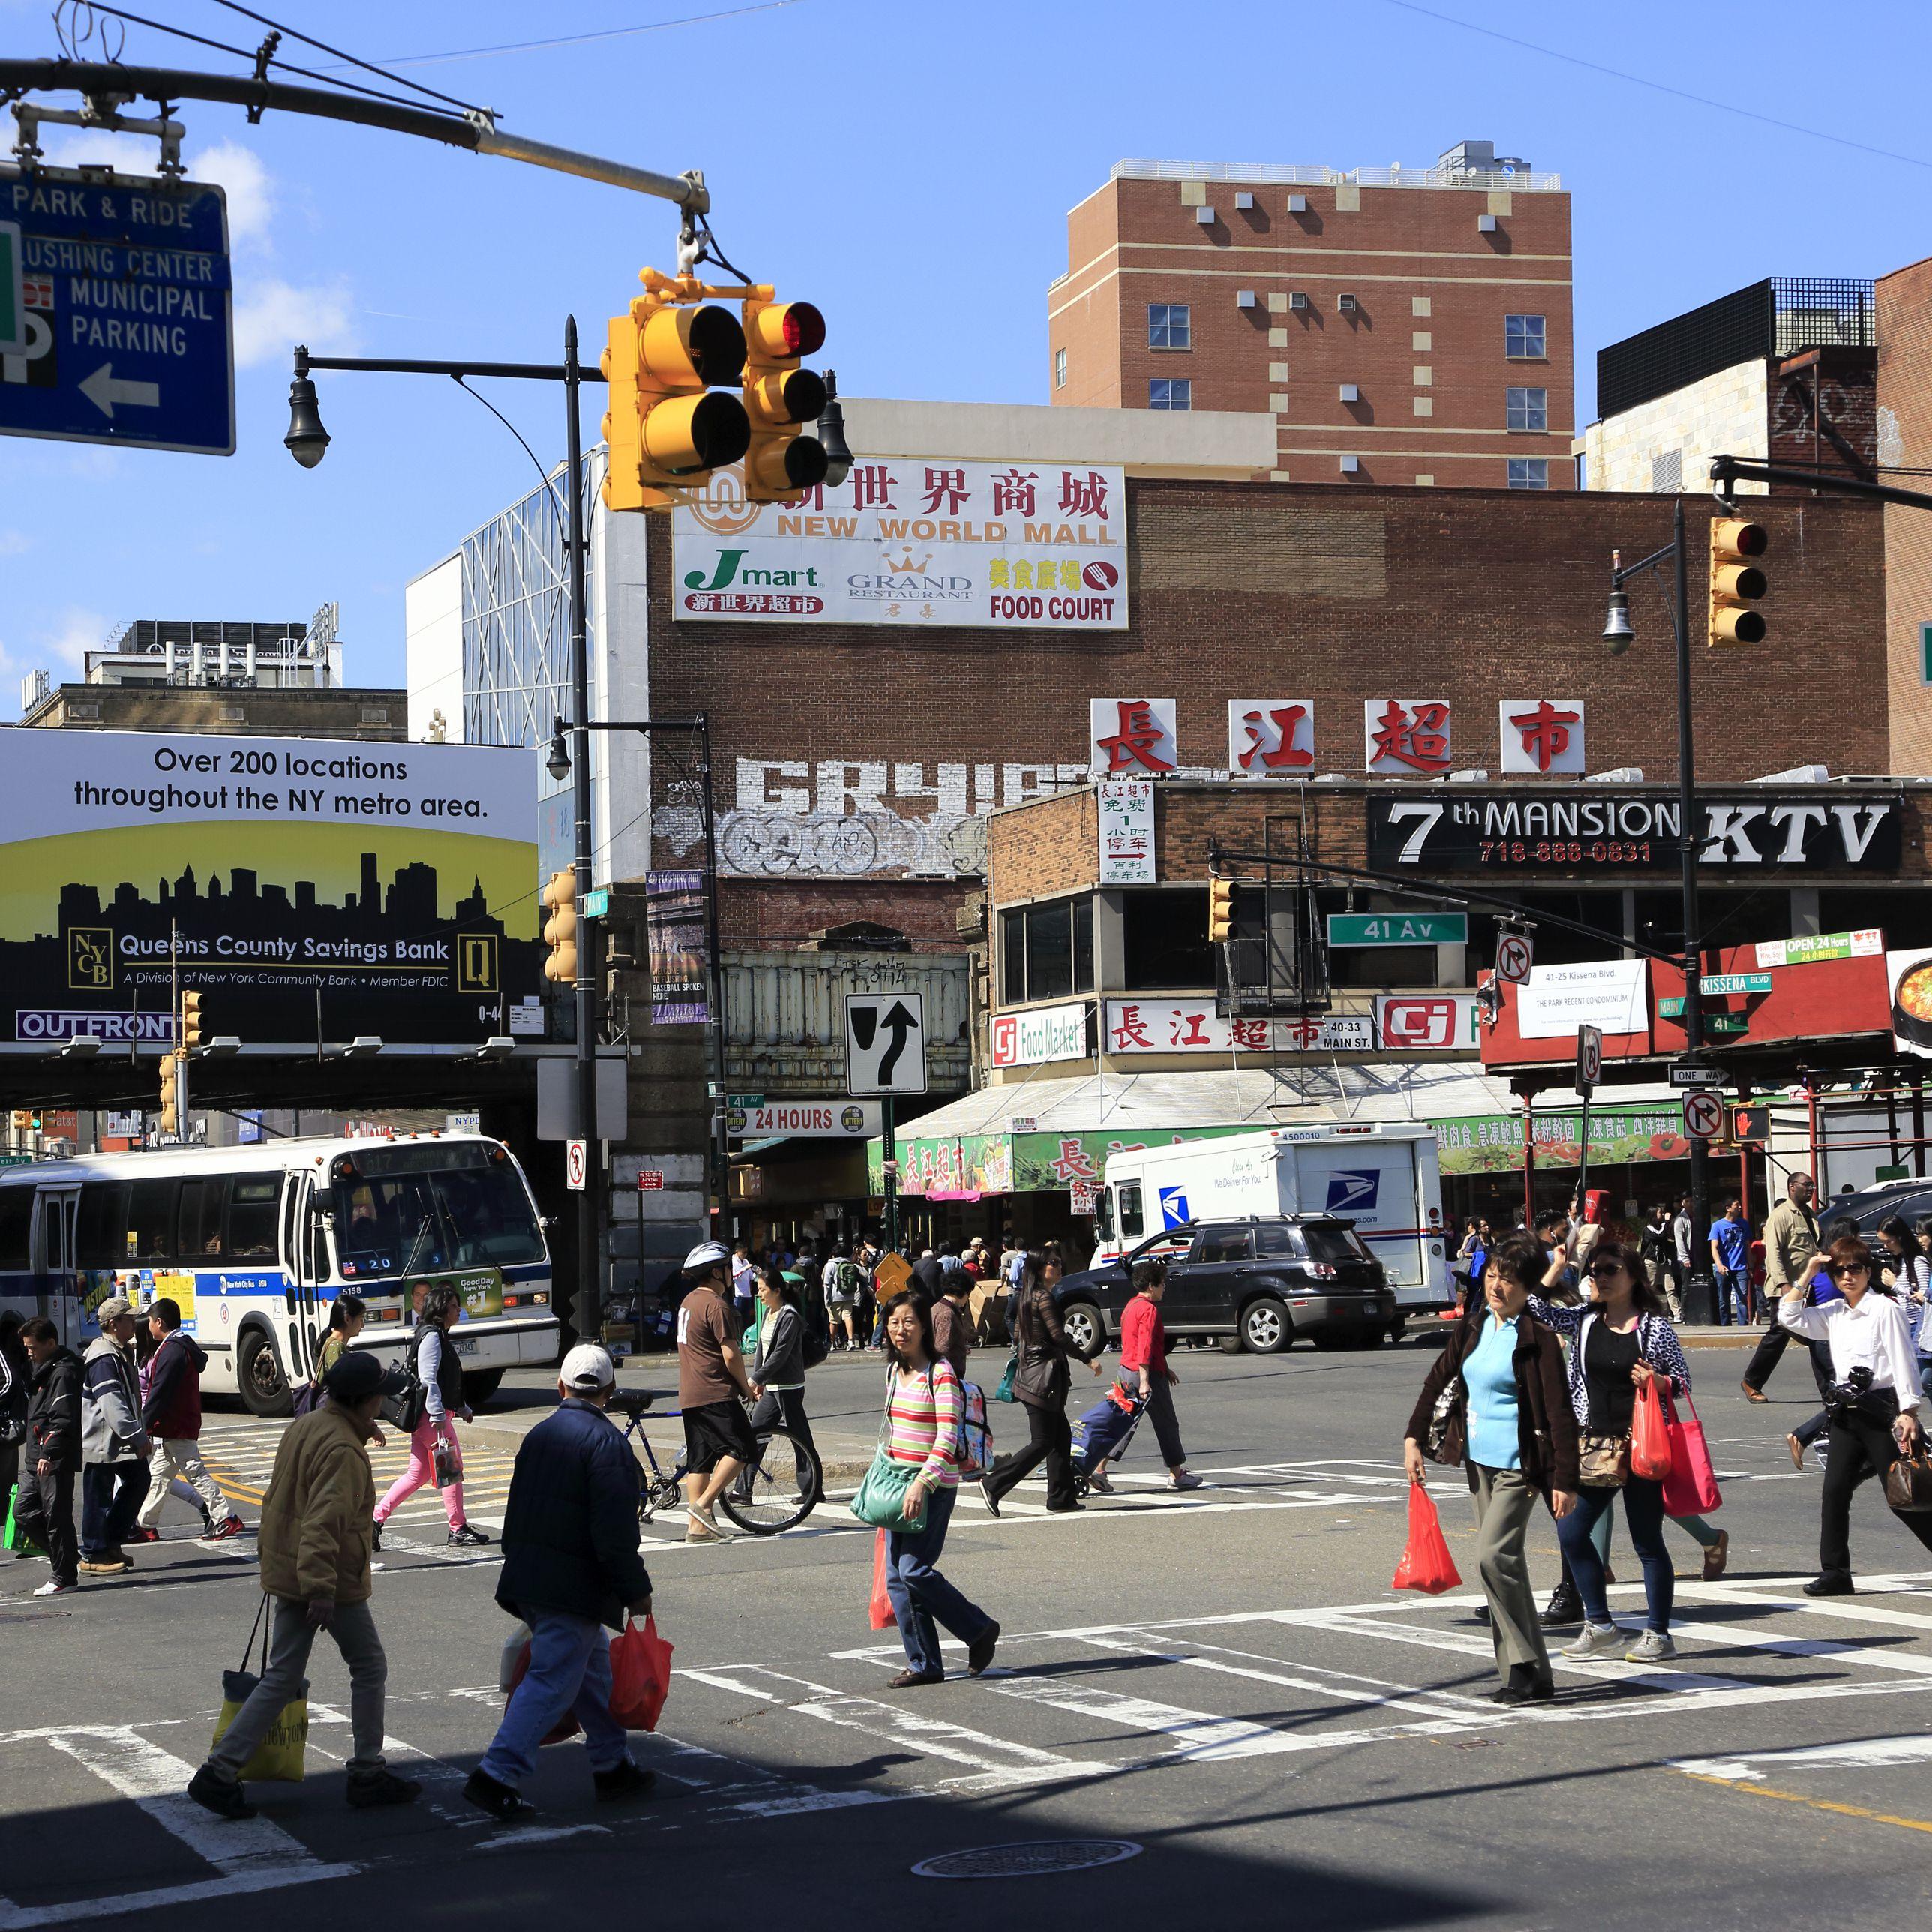 Flushing Queens New York A